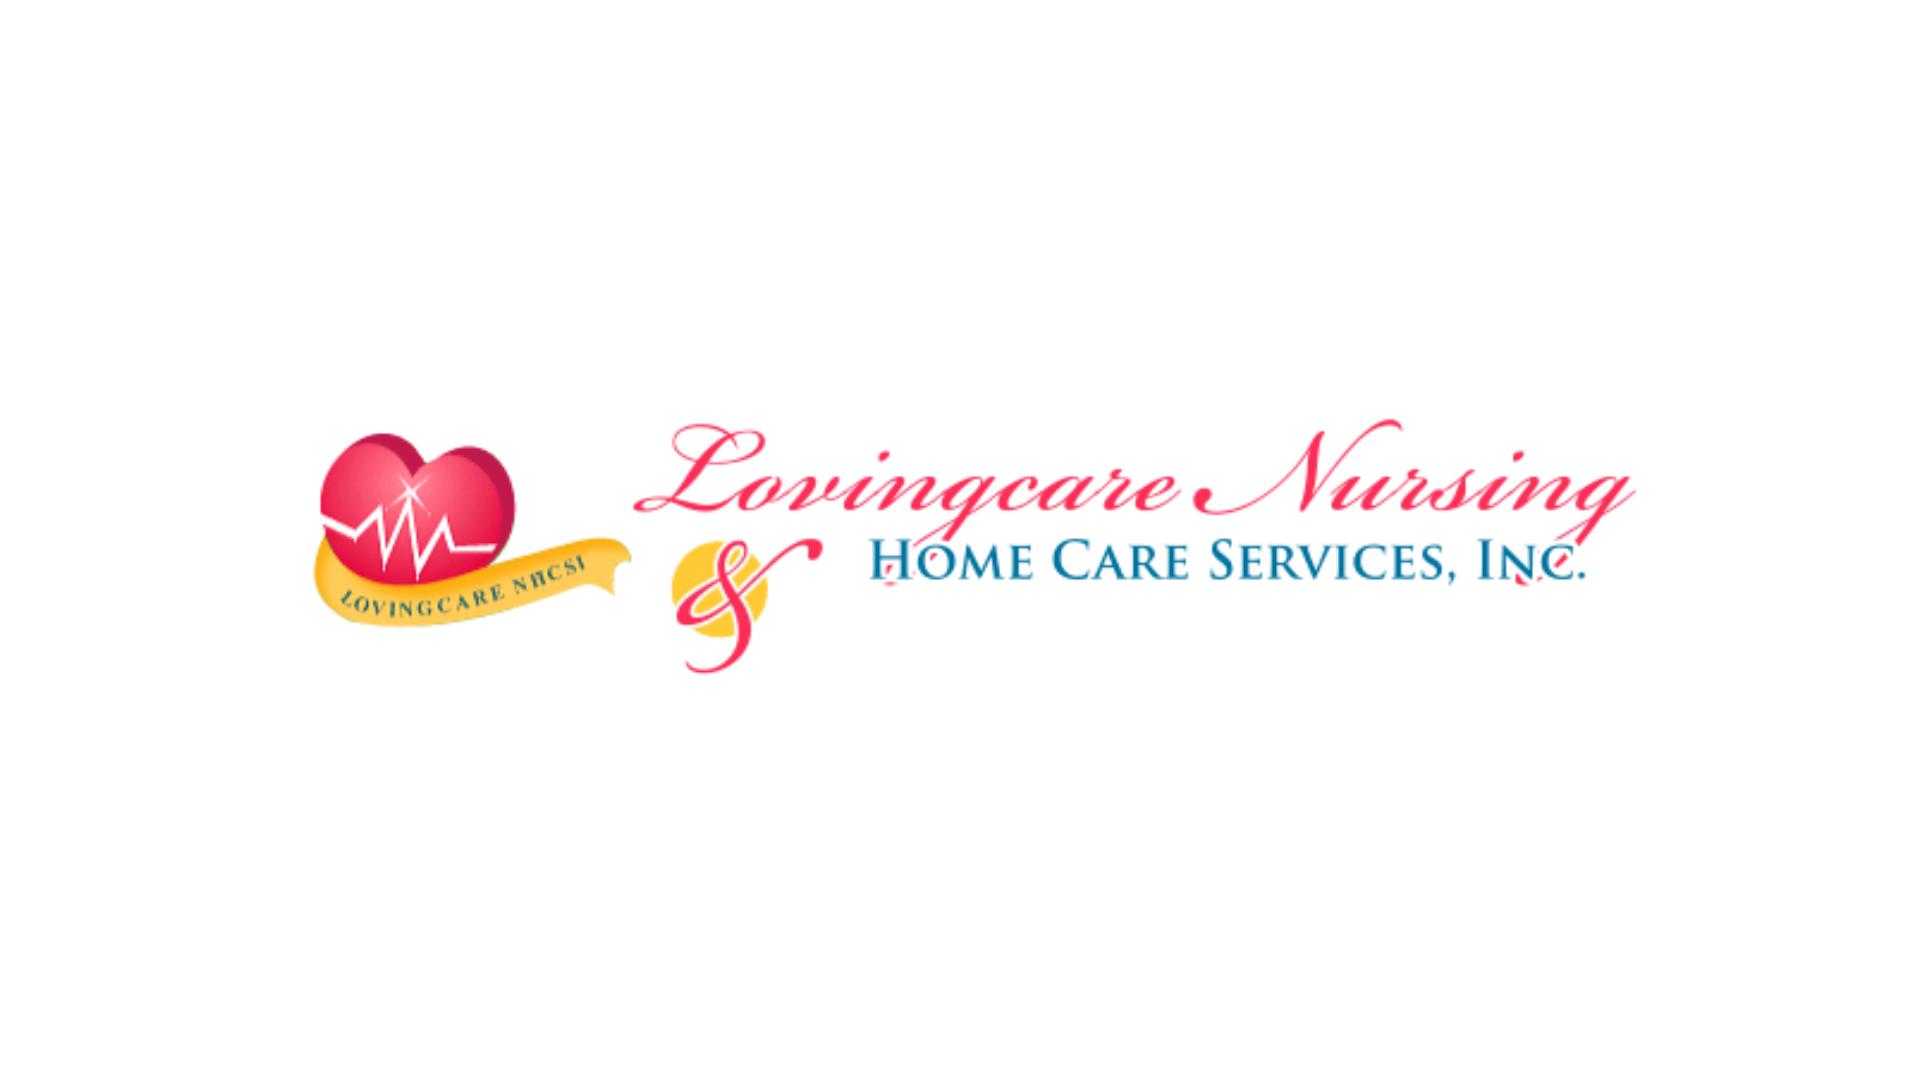 Lovingcare Nursing & Home Care Services INC.